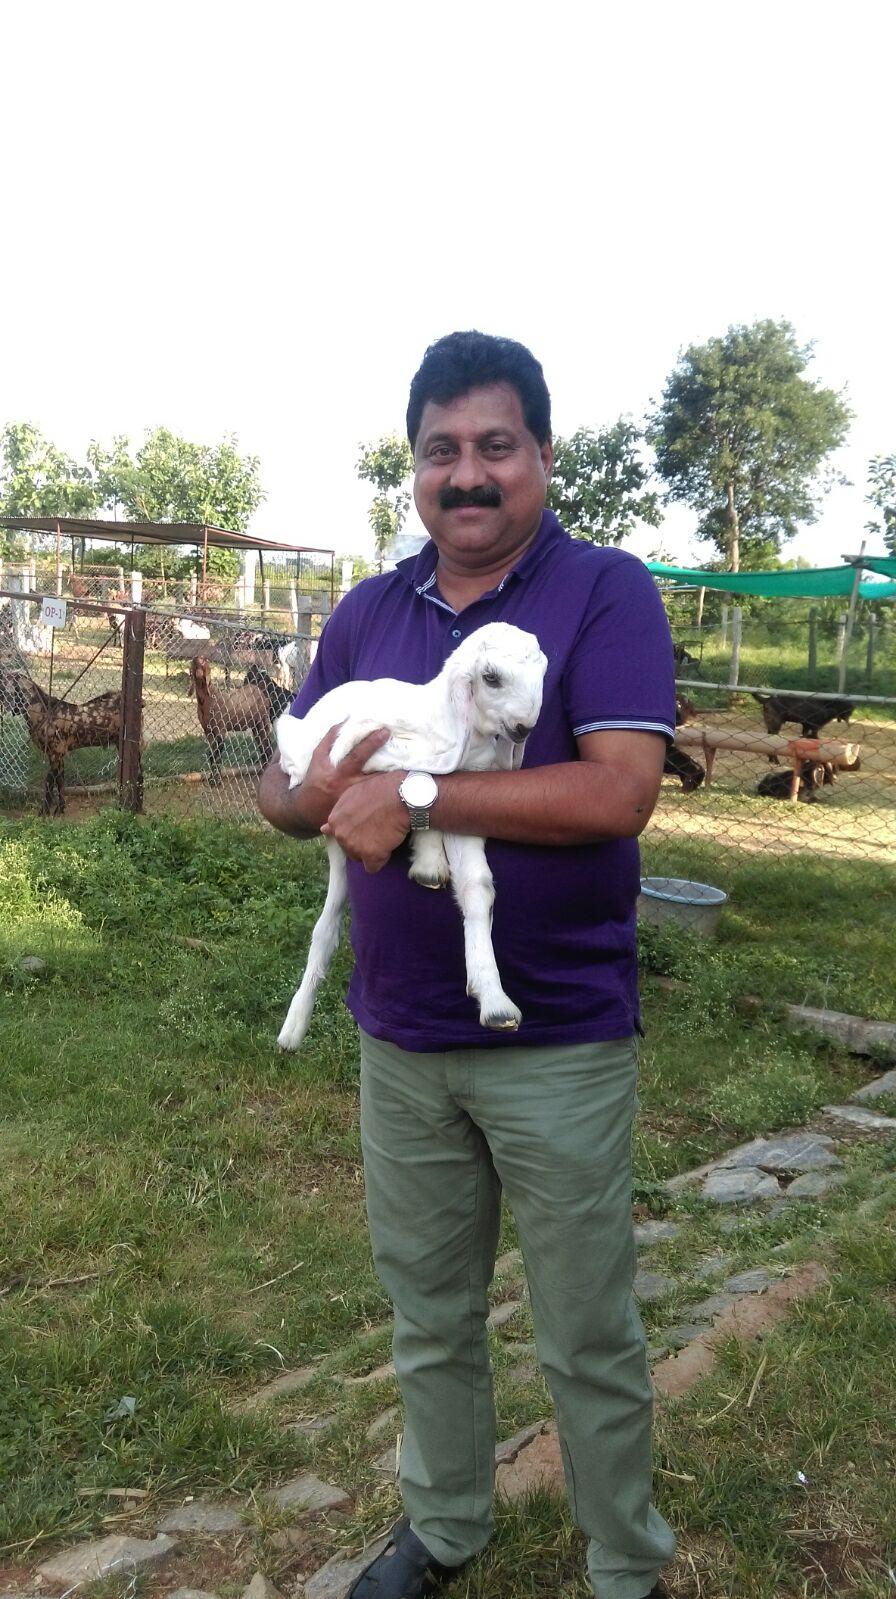 Amma Bhagawan Goat Farm, outskirts of Mysuru, Karnataka.